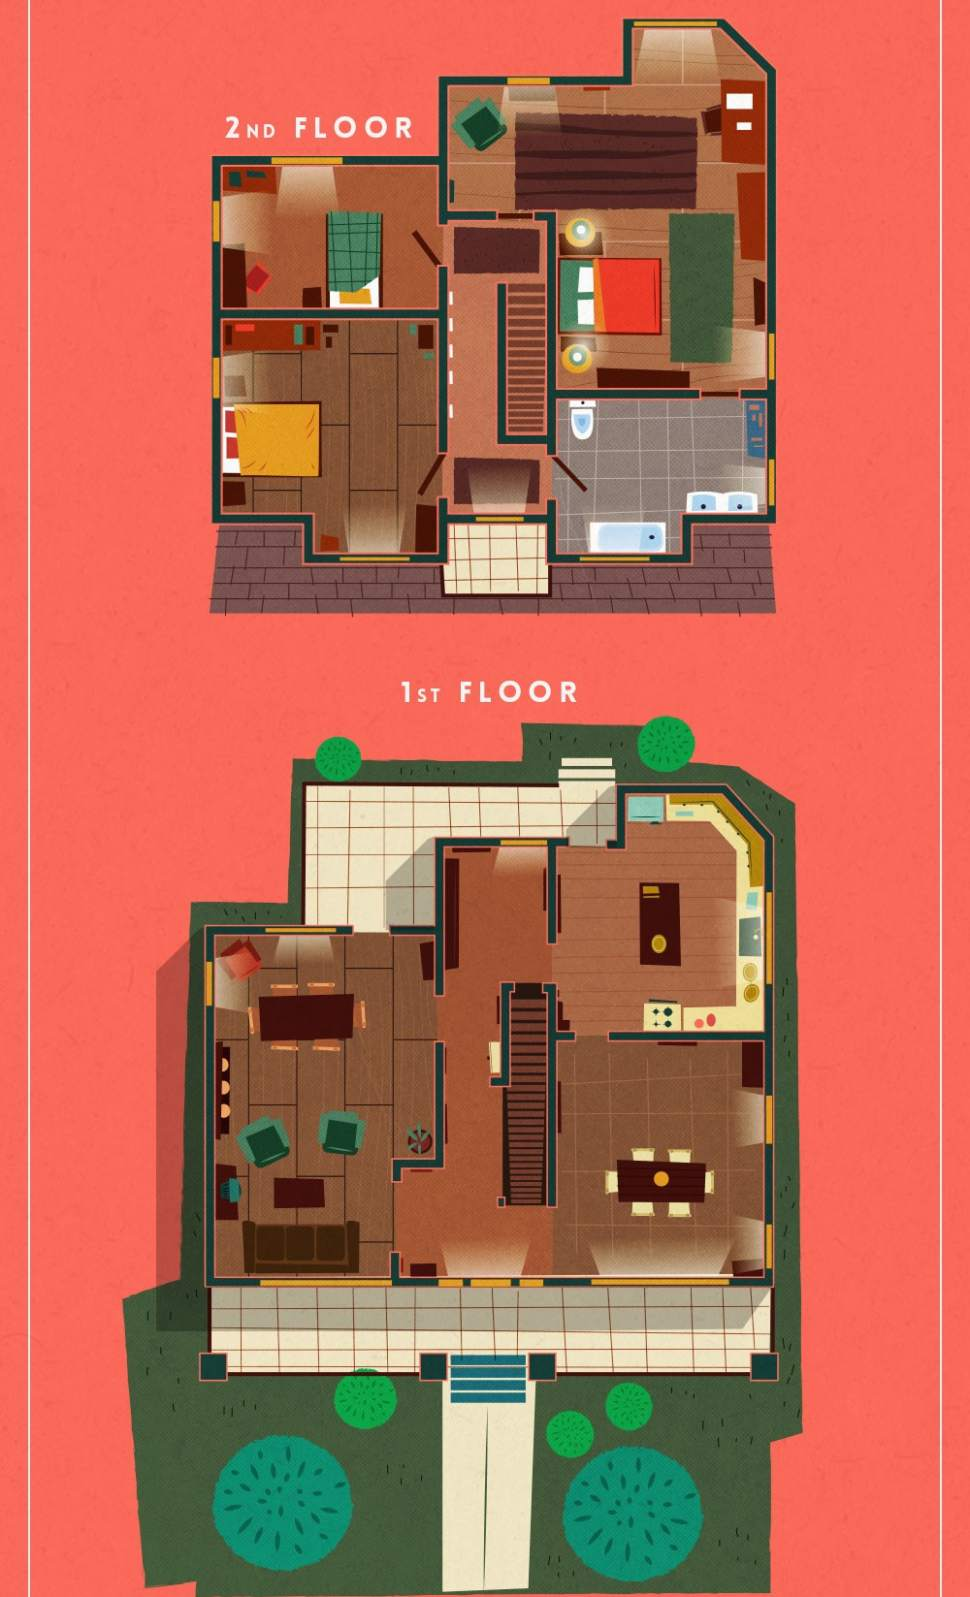 un portal inmobiliario recrea planos de casas de series